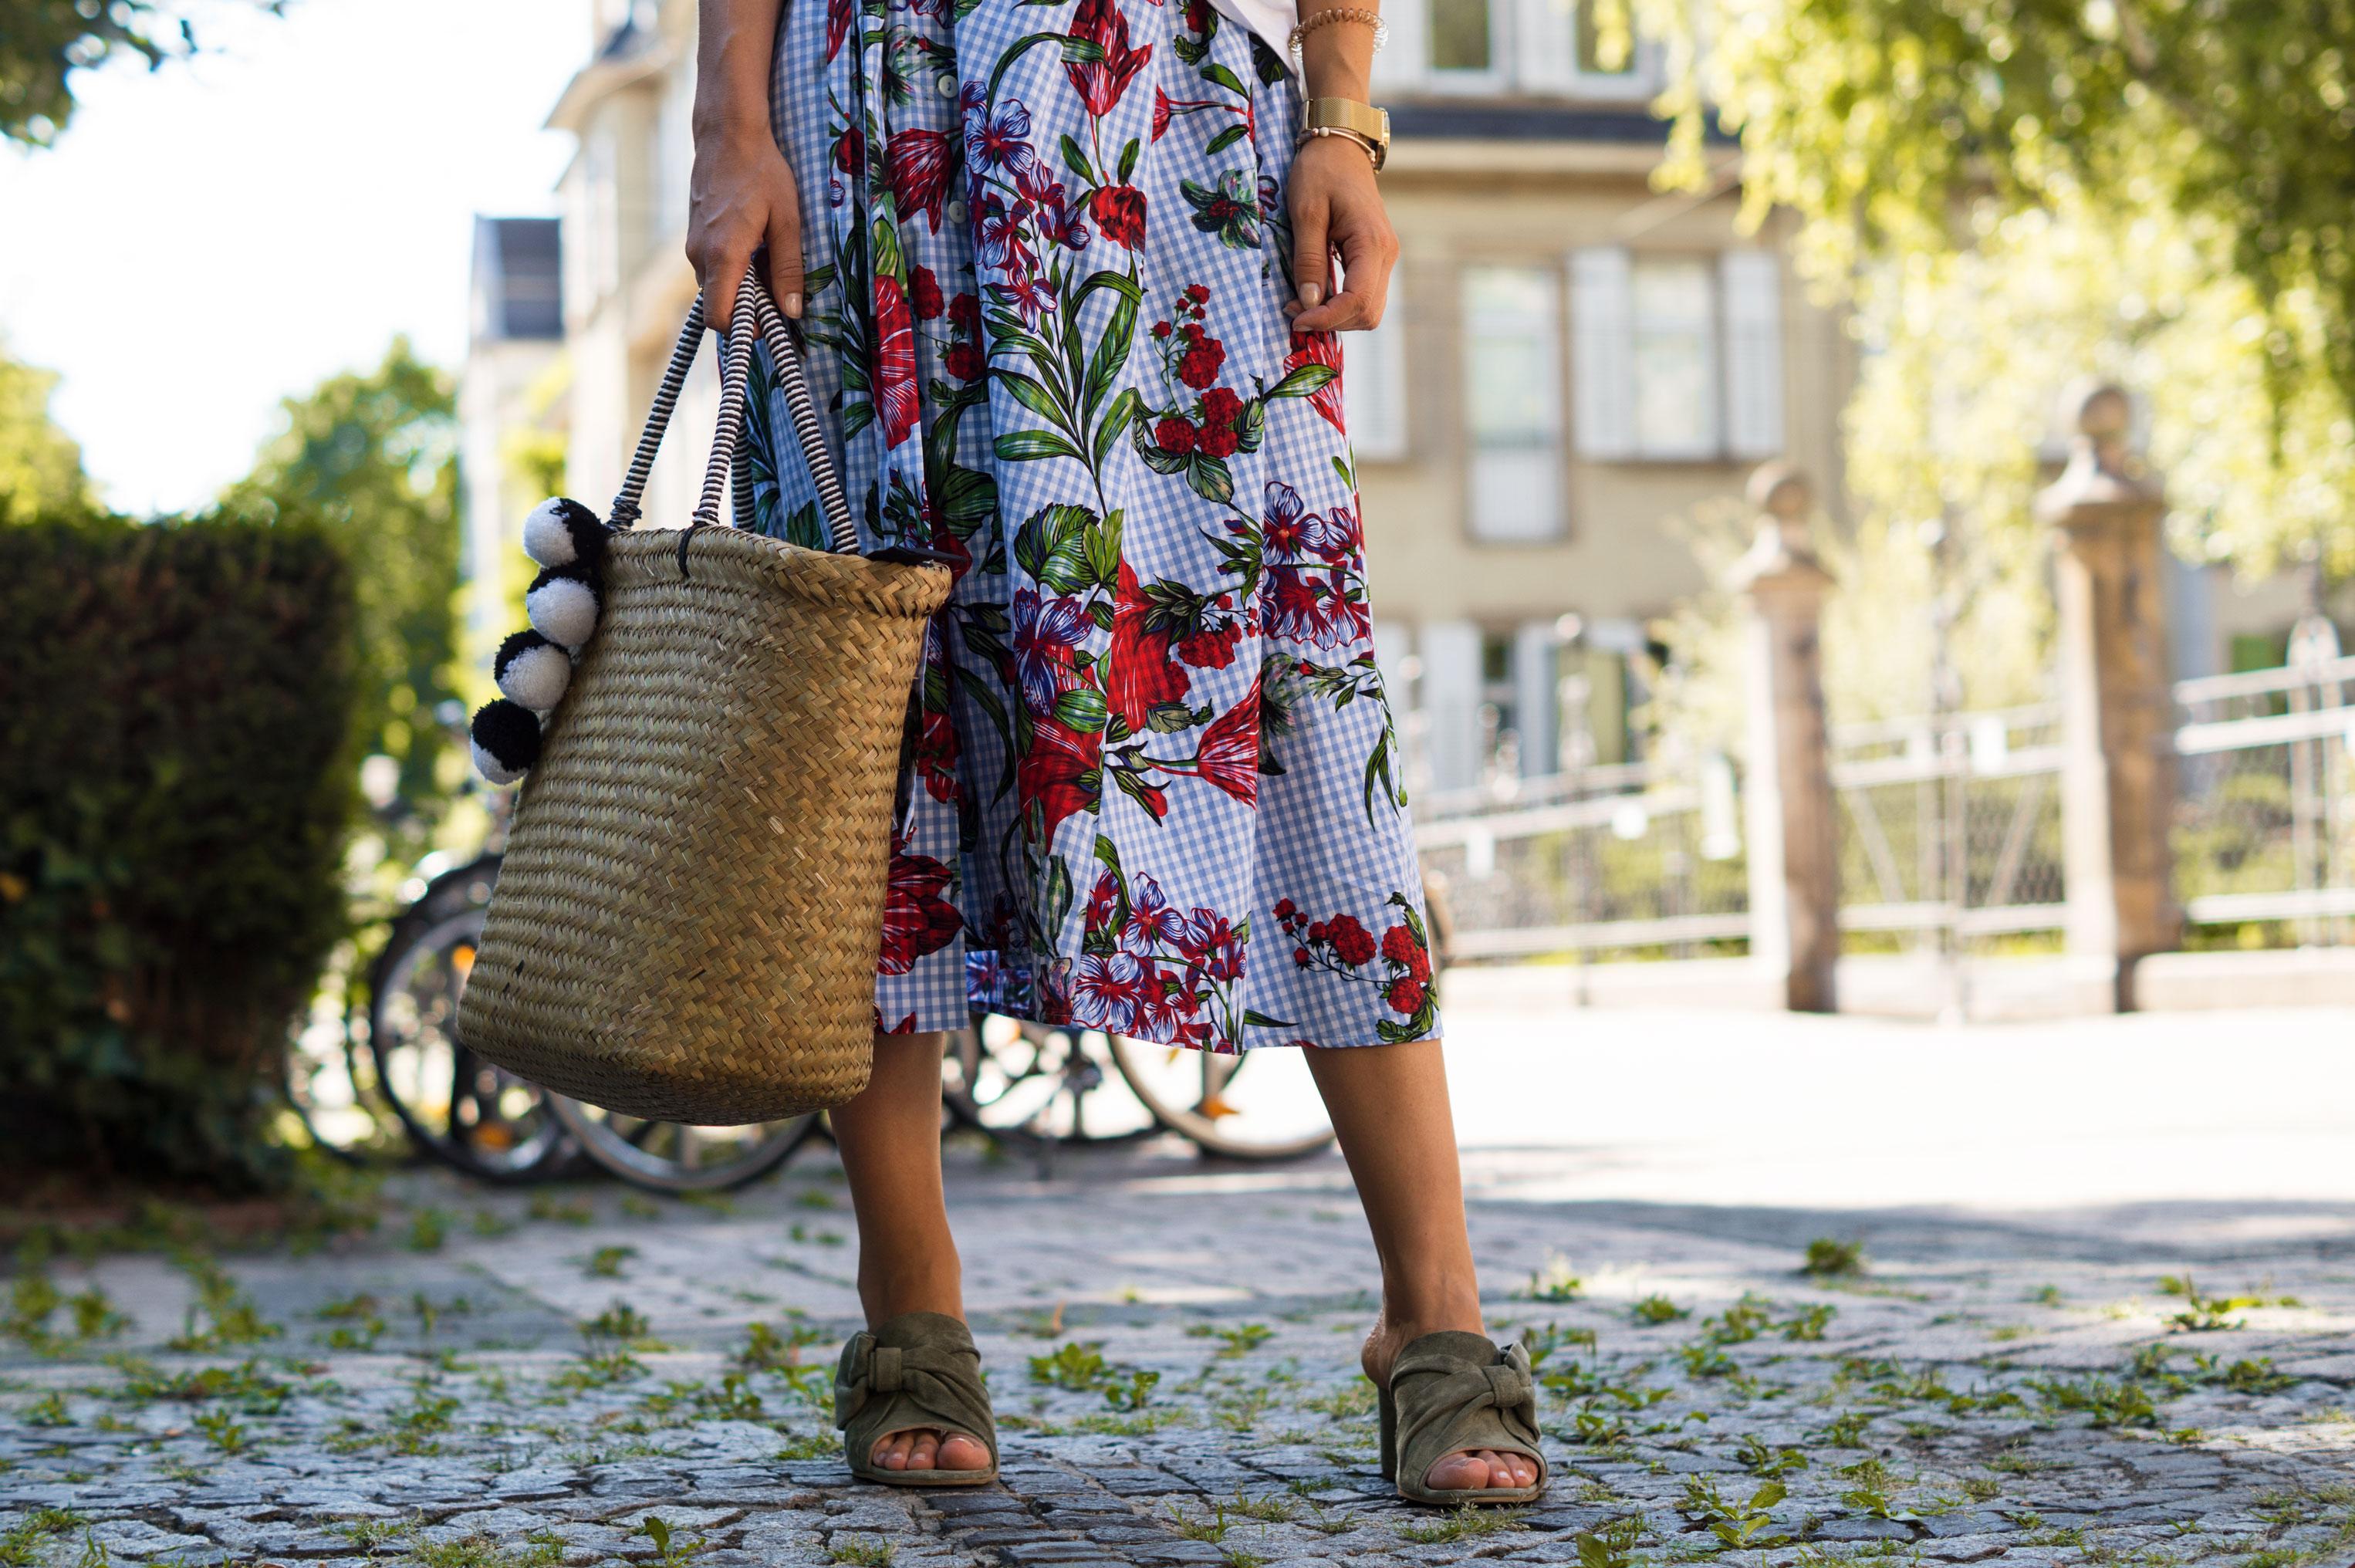 Zara Midi Skirt Ginham Floral Print Blumenmuster karierter Rock Print Shirt Manfield Mules Sariety Summer Shopping Look_3